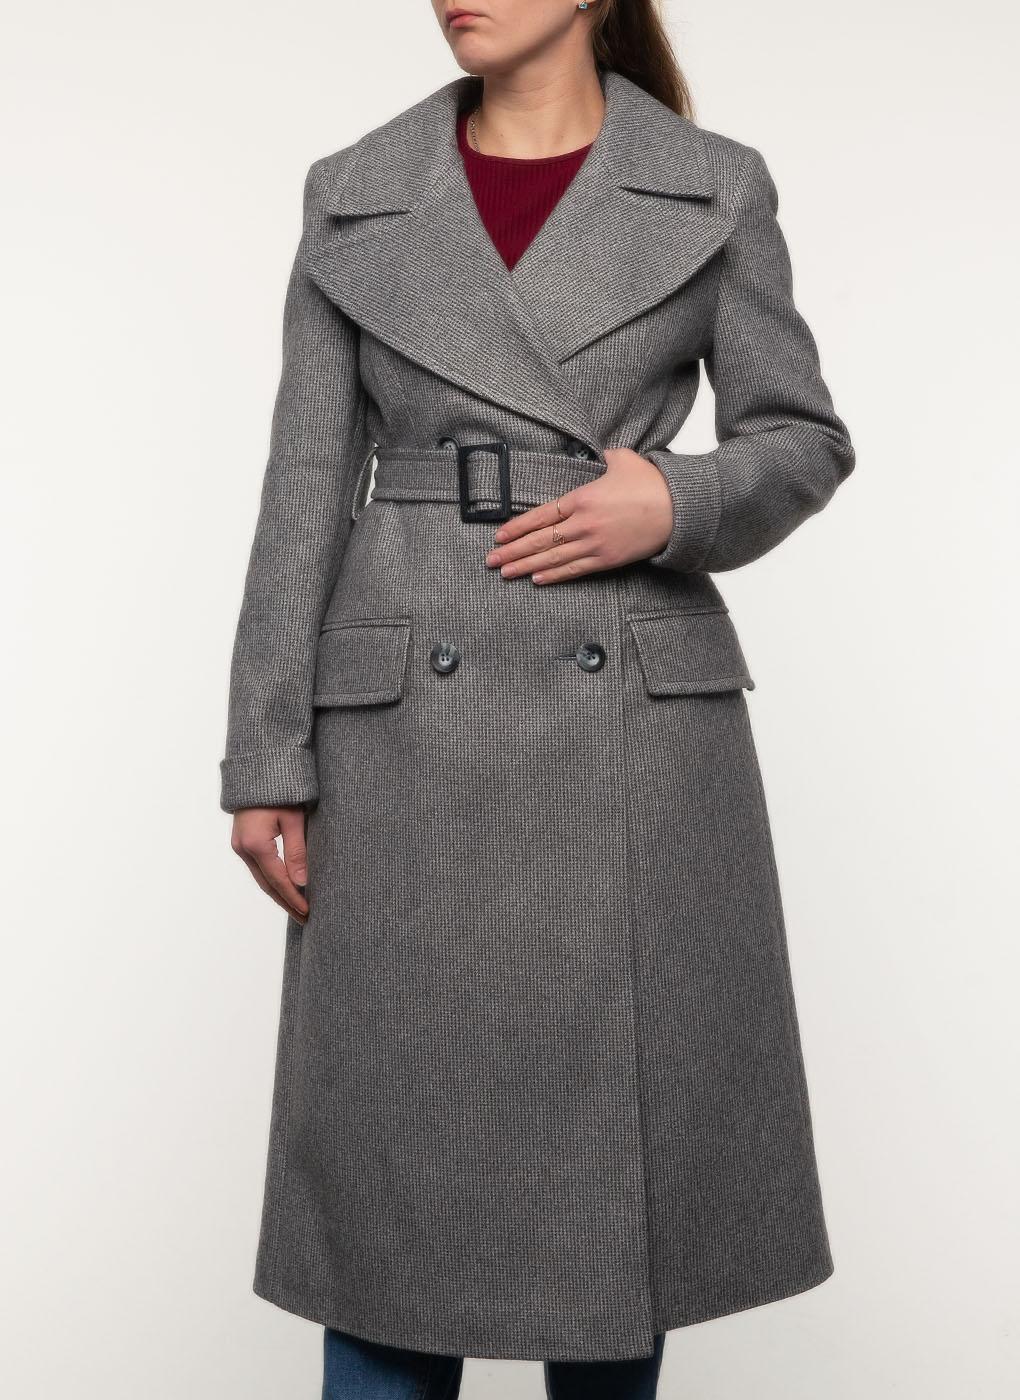 Пальто 84, Crosario фото